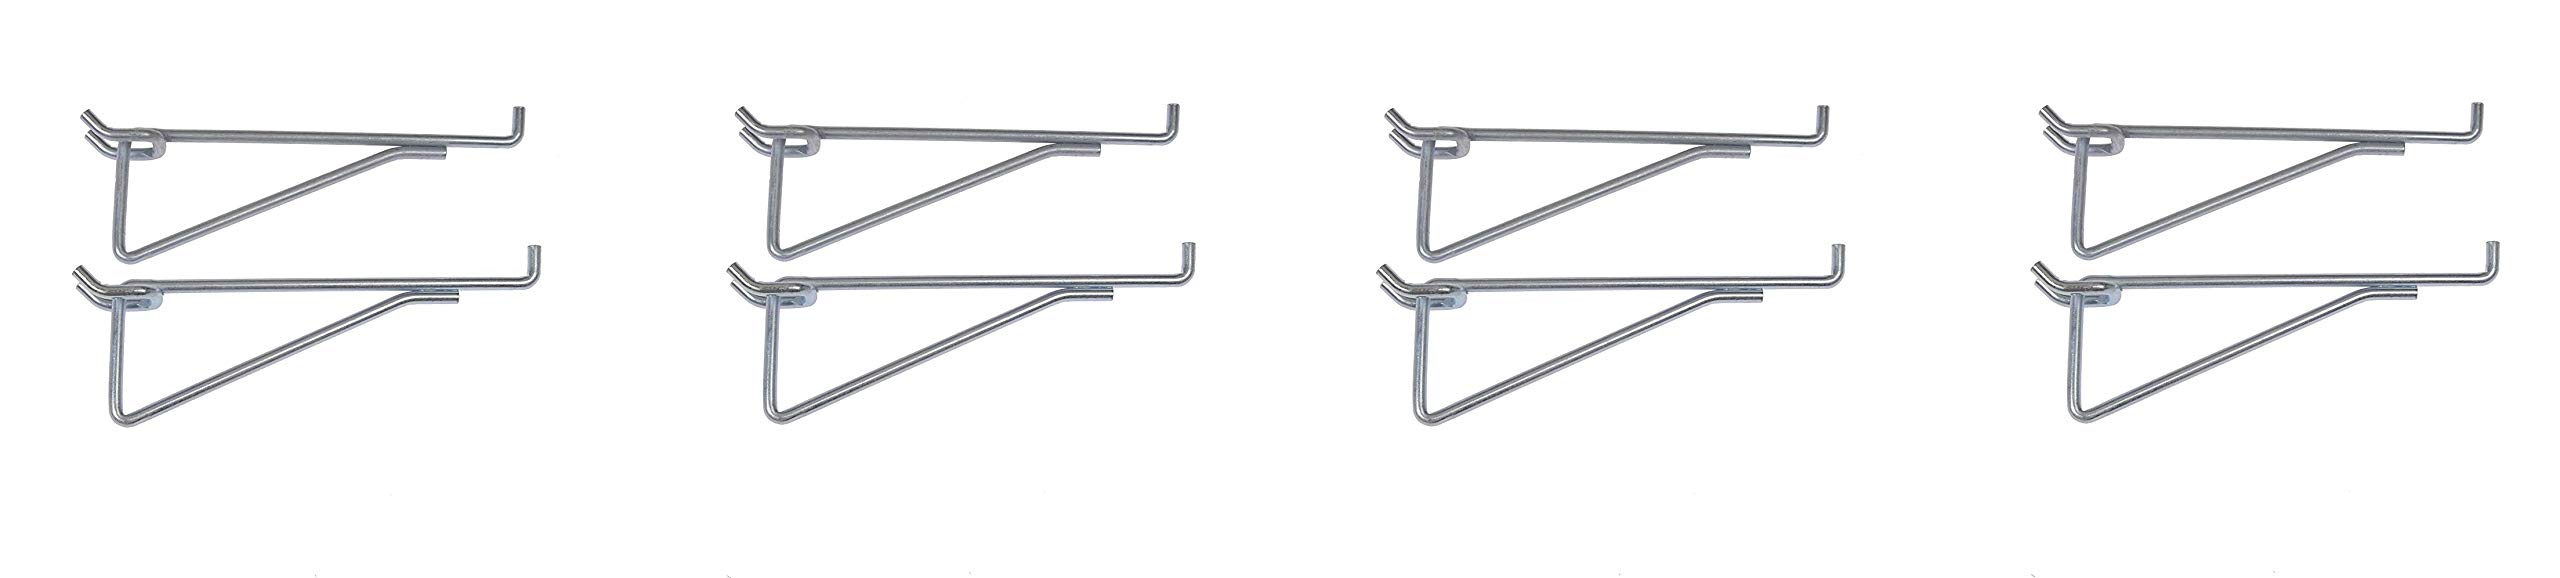 Dorman Hardware 4-9836 6-Inch Shelf Peghooks, 2-Pack (Fоur Расk)